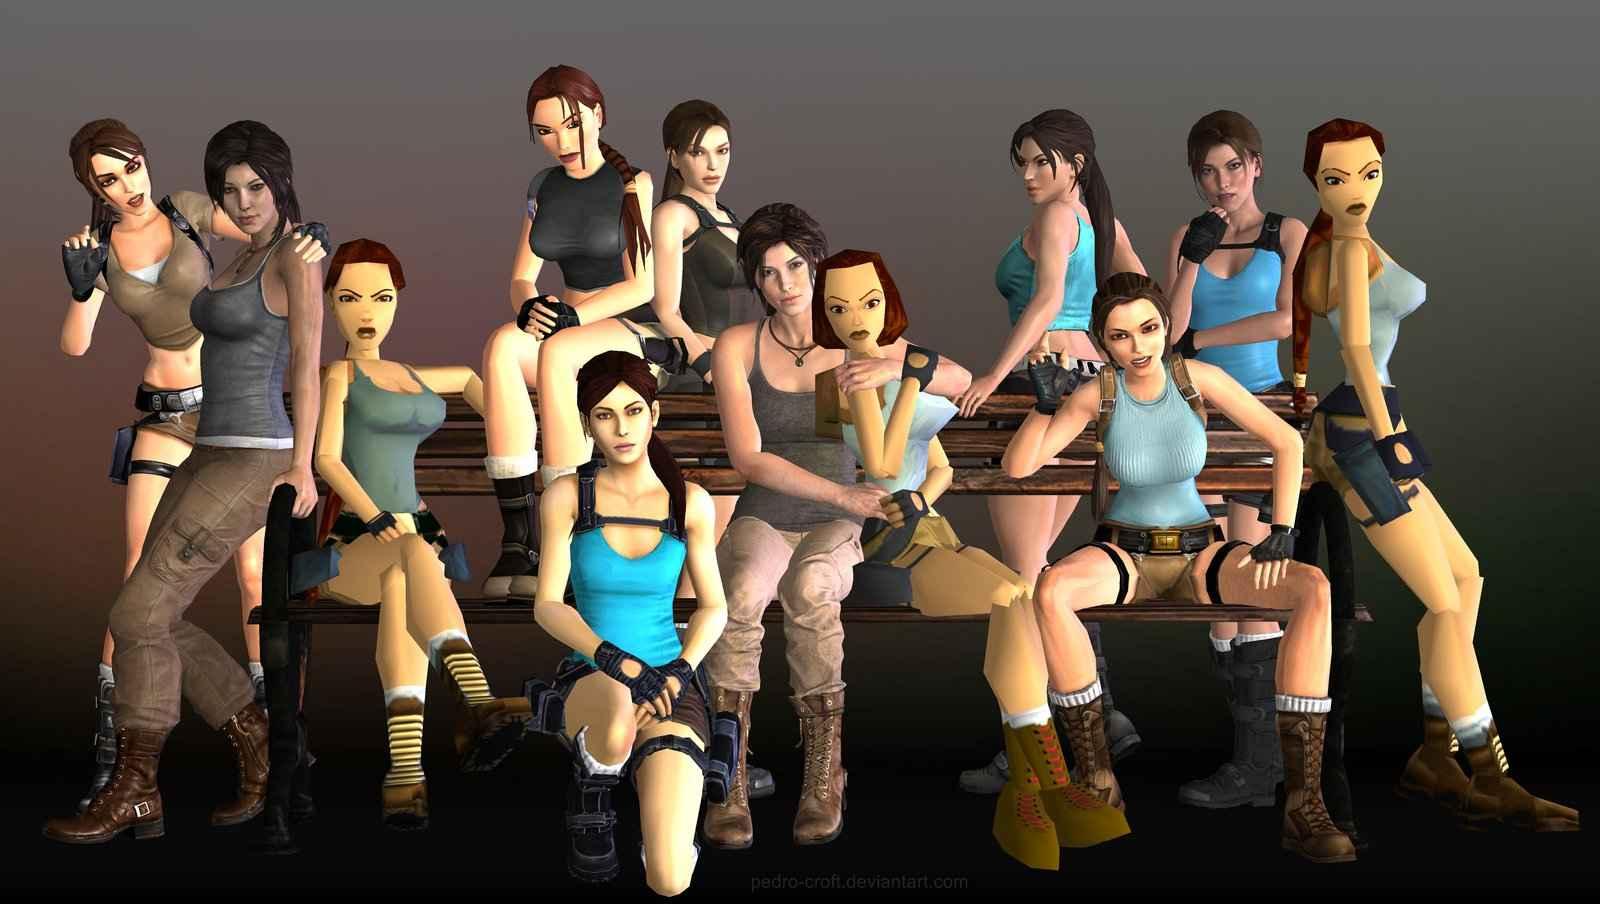 Tomb Raider History Celebrating 20 Years Of Lara Croft